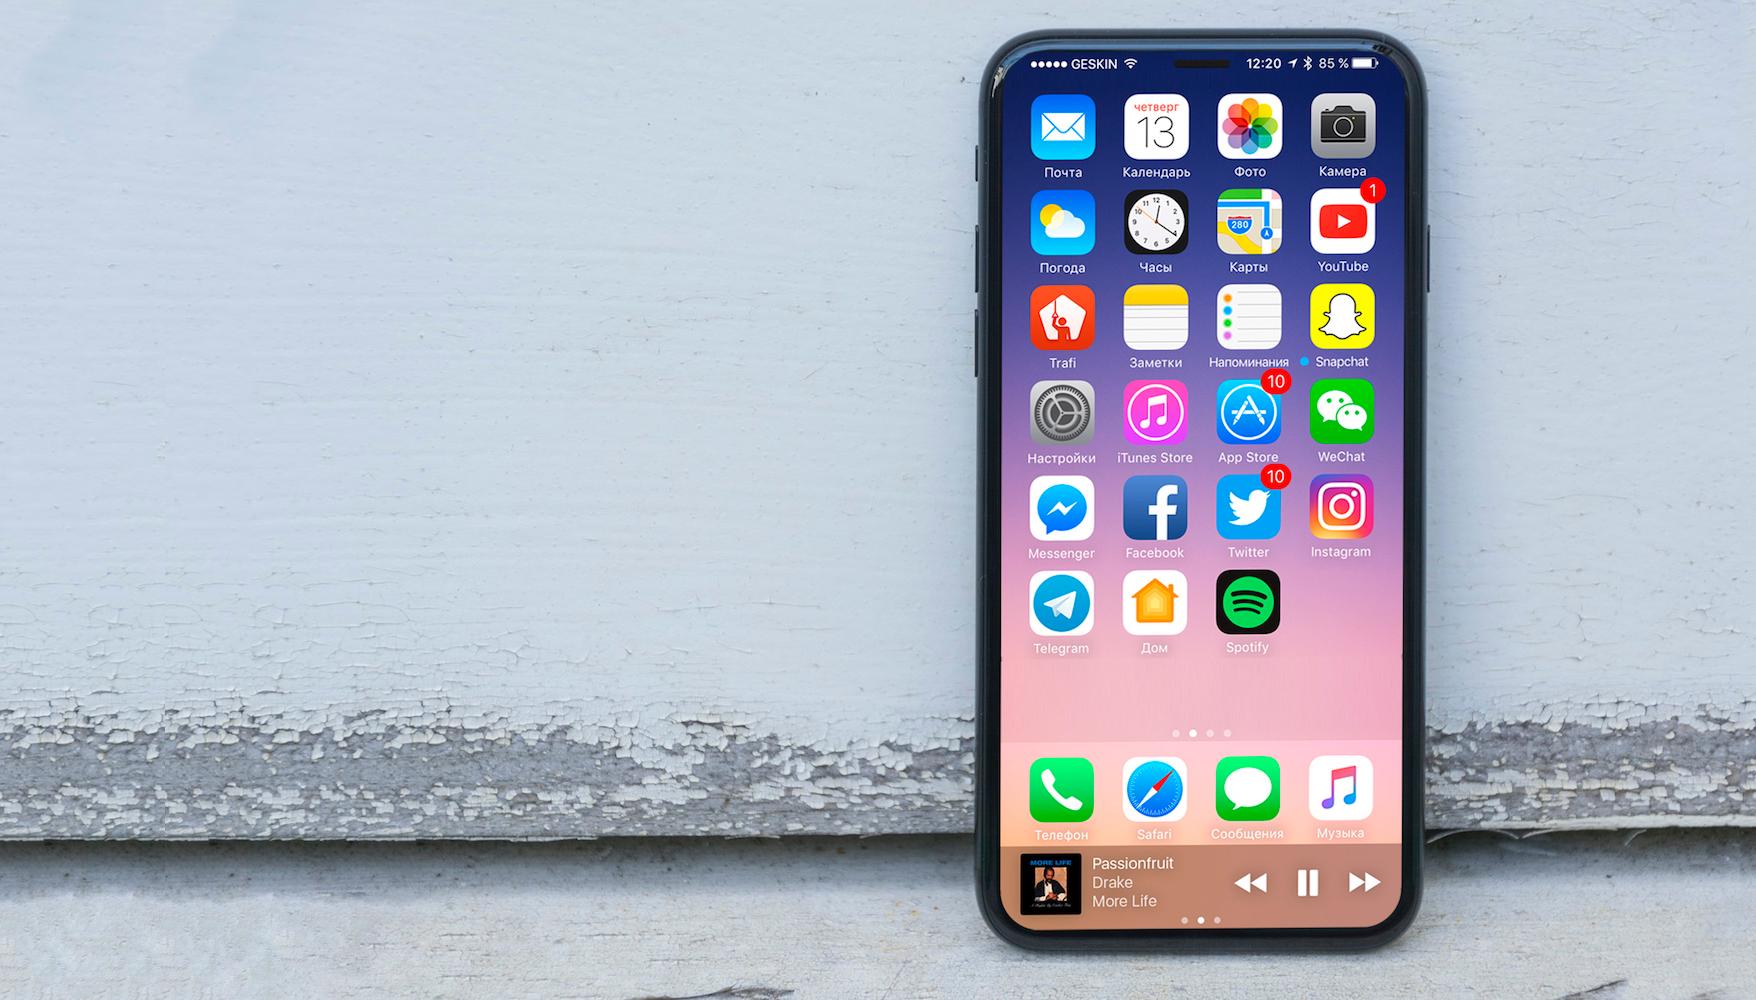 iphone 8 concept 16x9